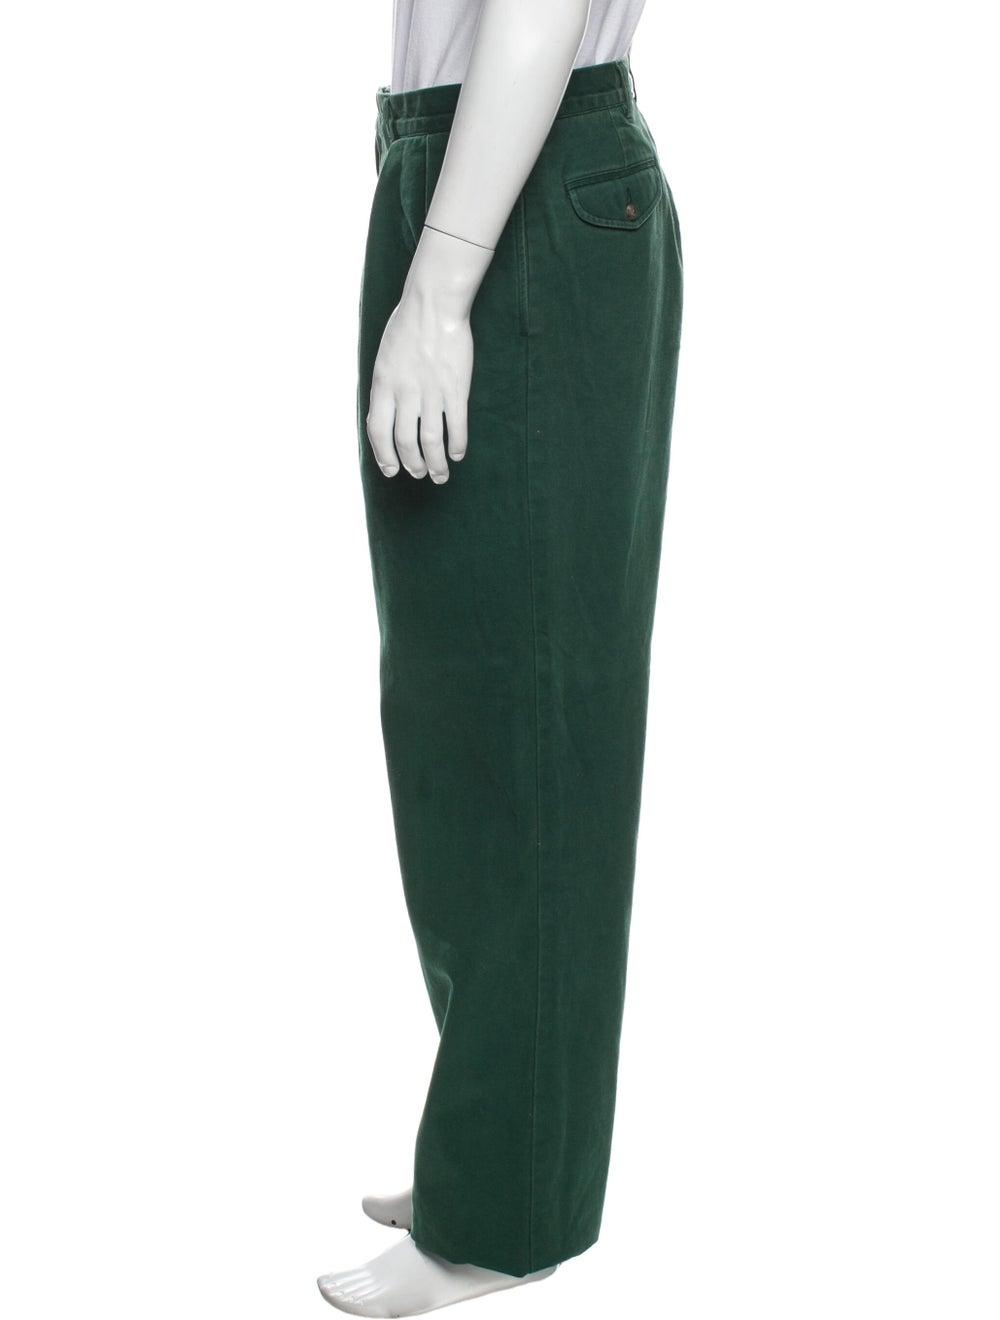 Polo Ralph Lauren Pants Green - image 2